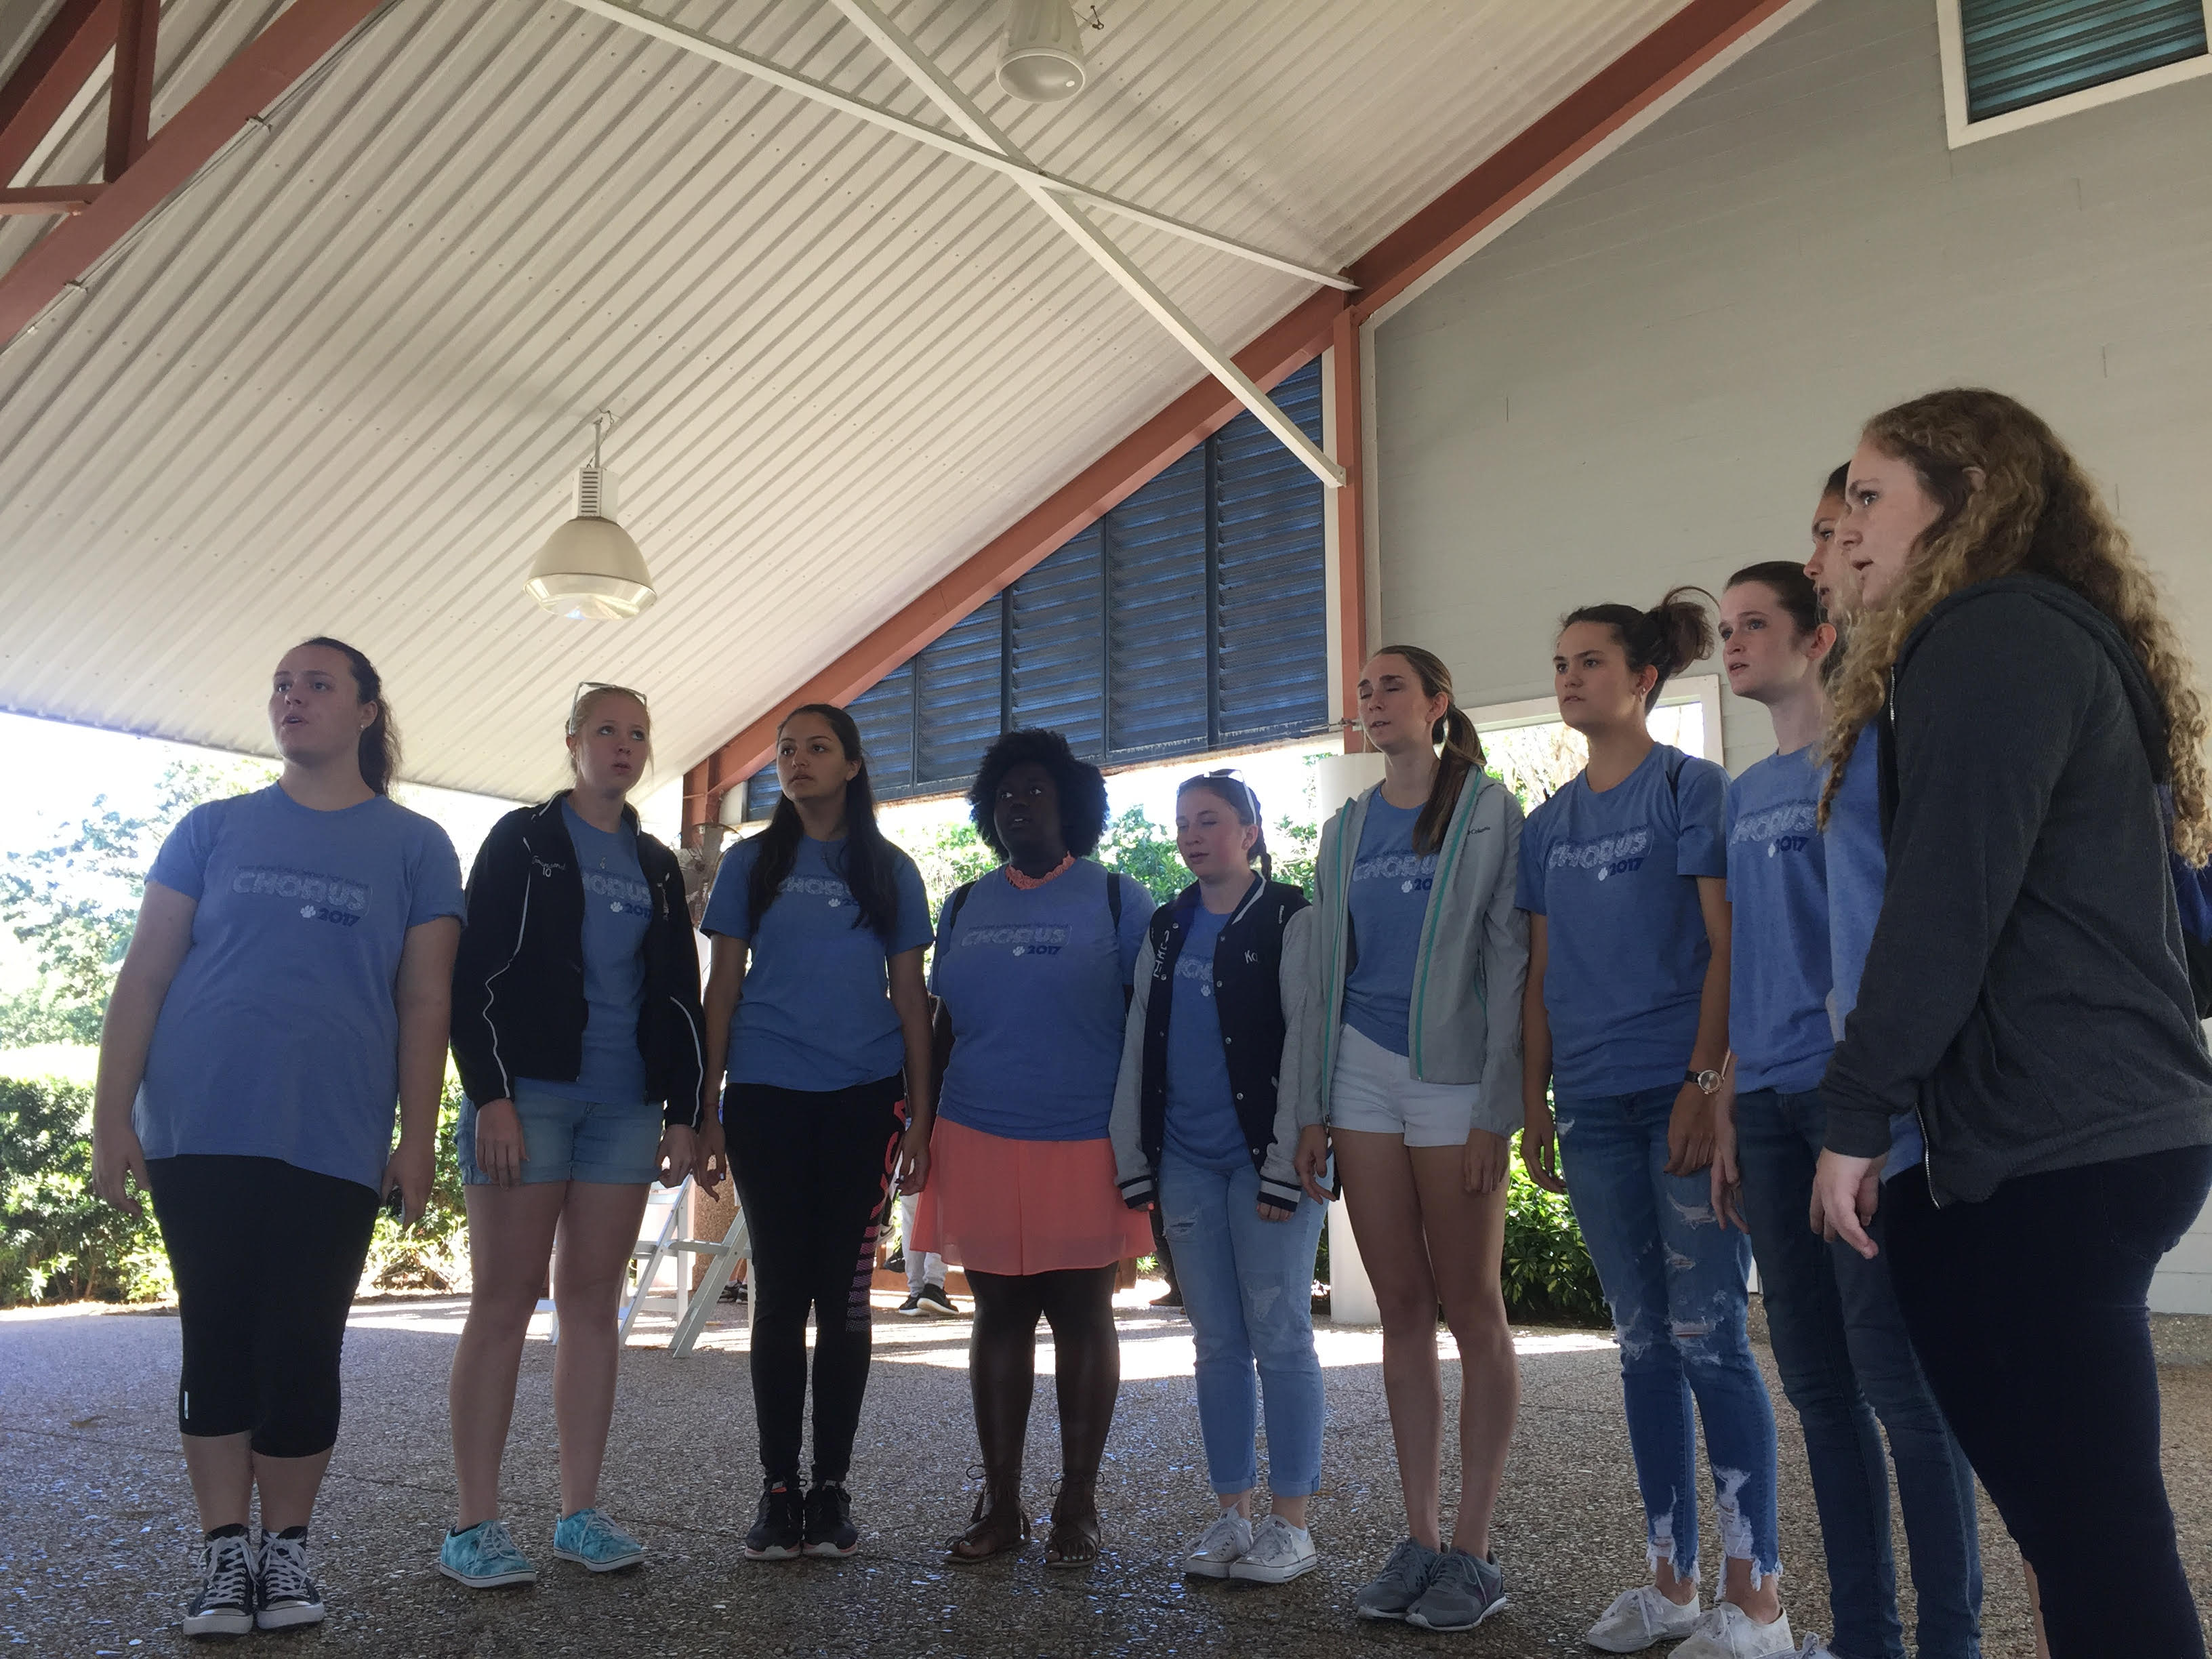 Women's chorus sings at Seaworld.